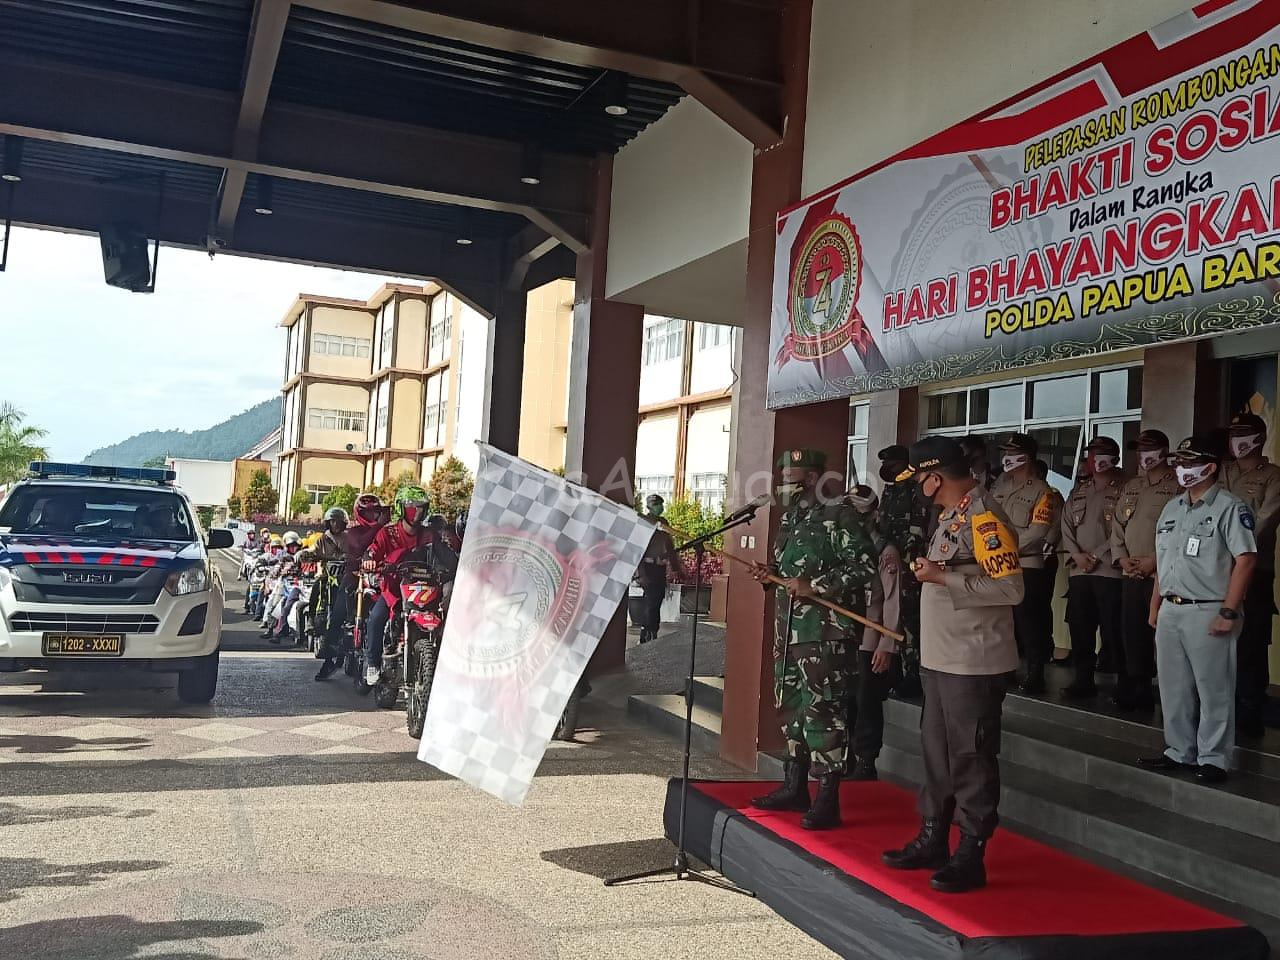 Polda Papua Barat Bagi Sembako Untuk TKBM, Ojek Dan Tenaga Medis Manokwari 15 IMG 20200626 WA0023